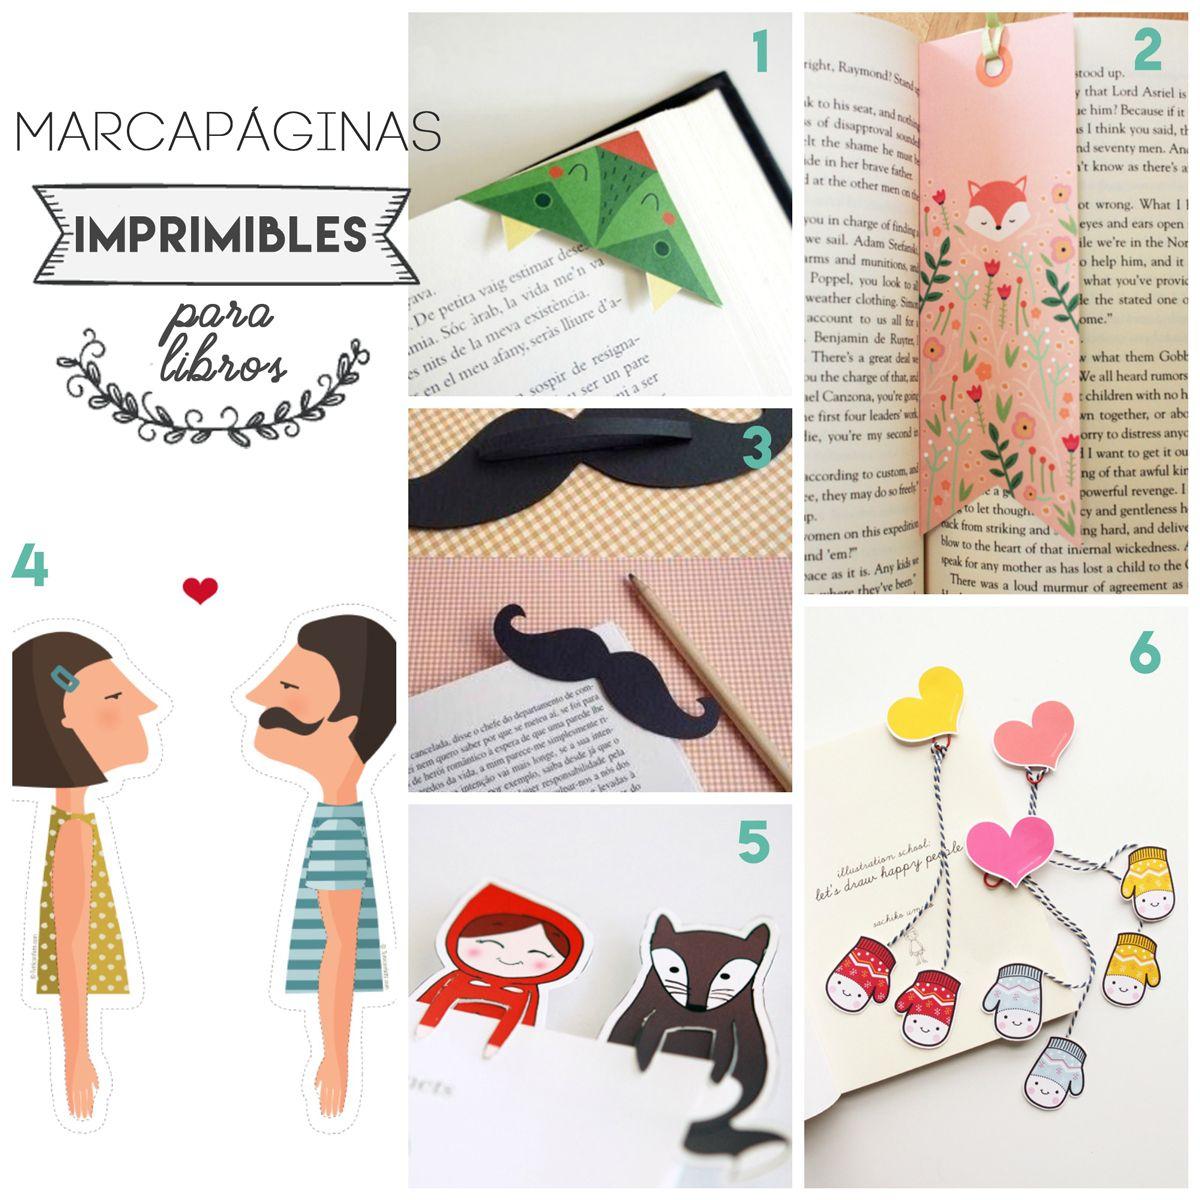 6 marcapaginas para libros imprimir gratis para regalar 6 for Libros para regalar